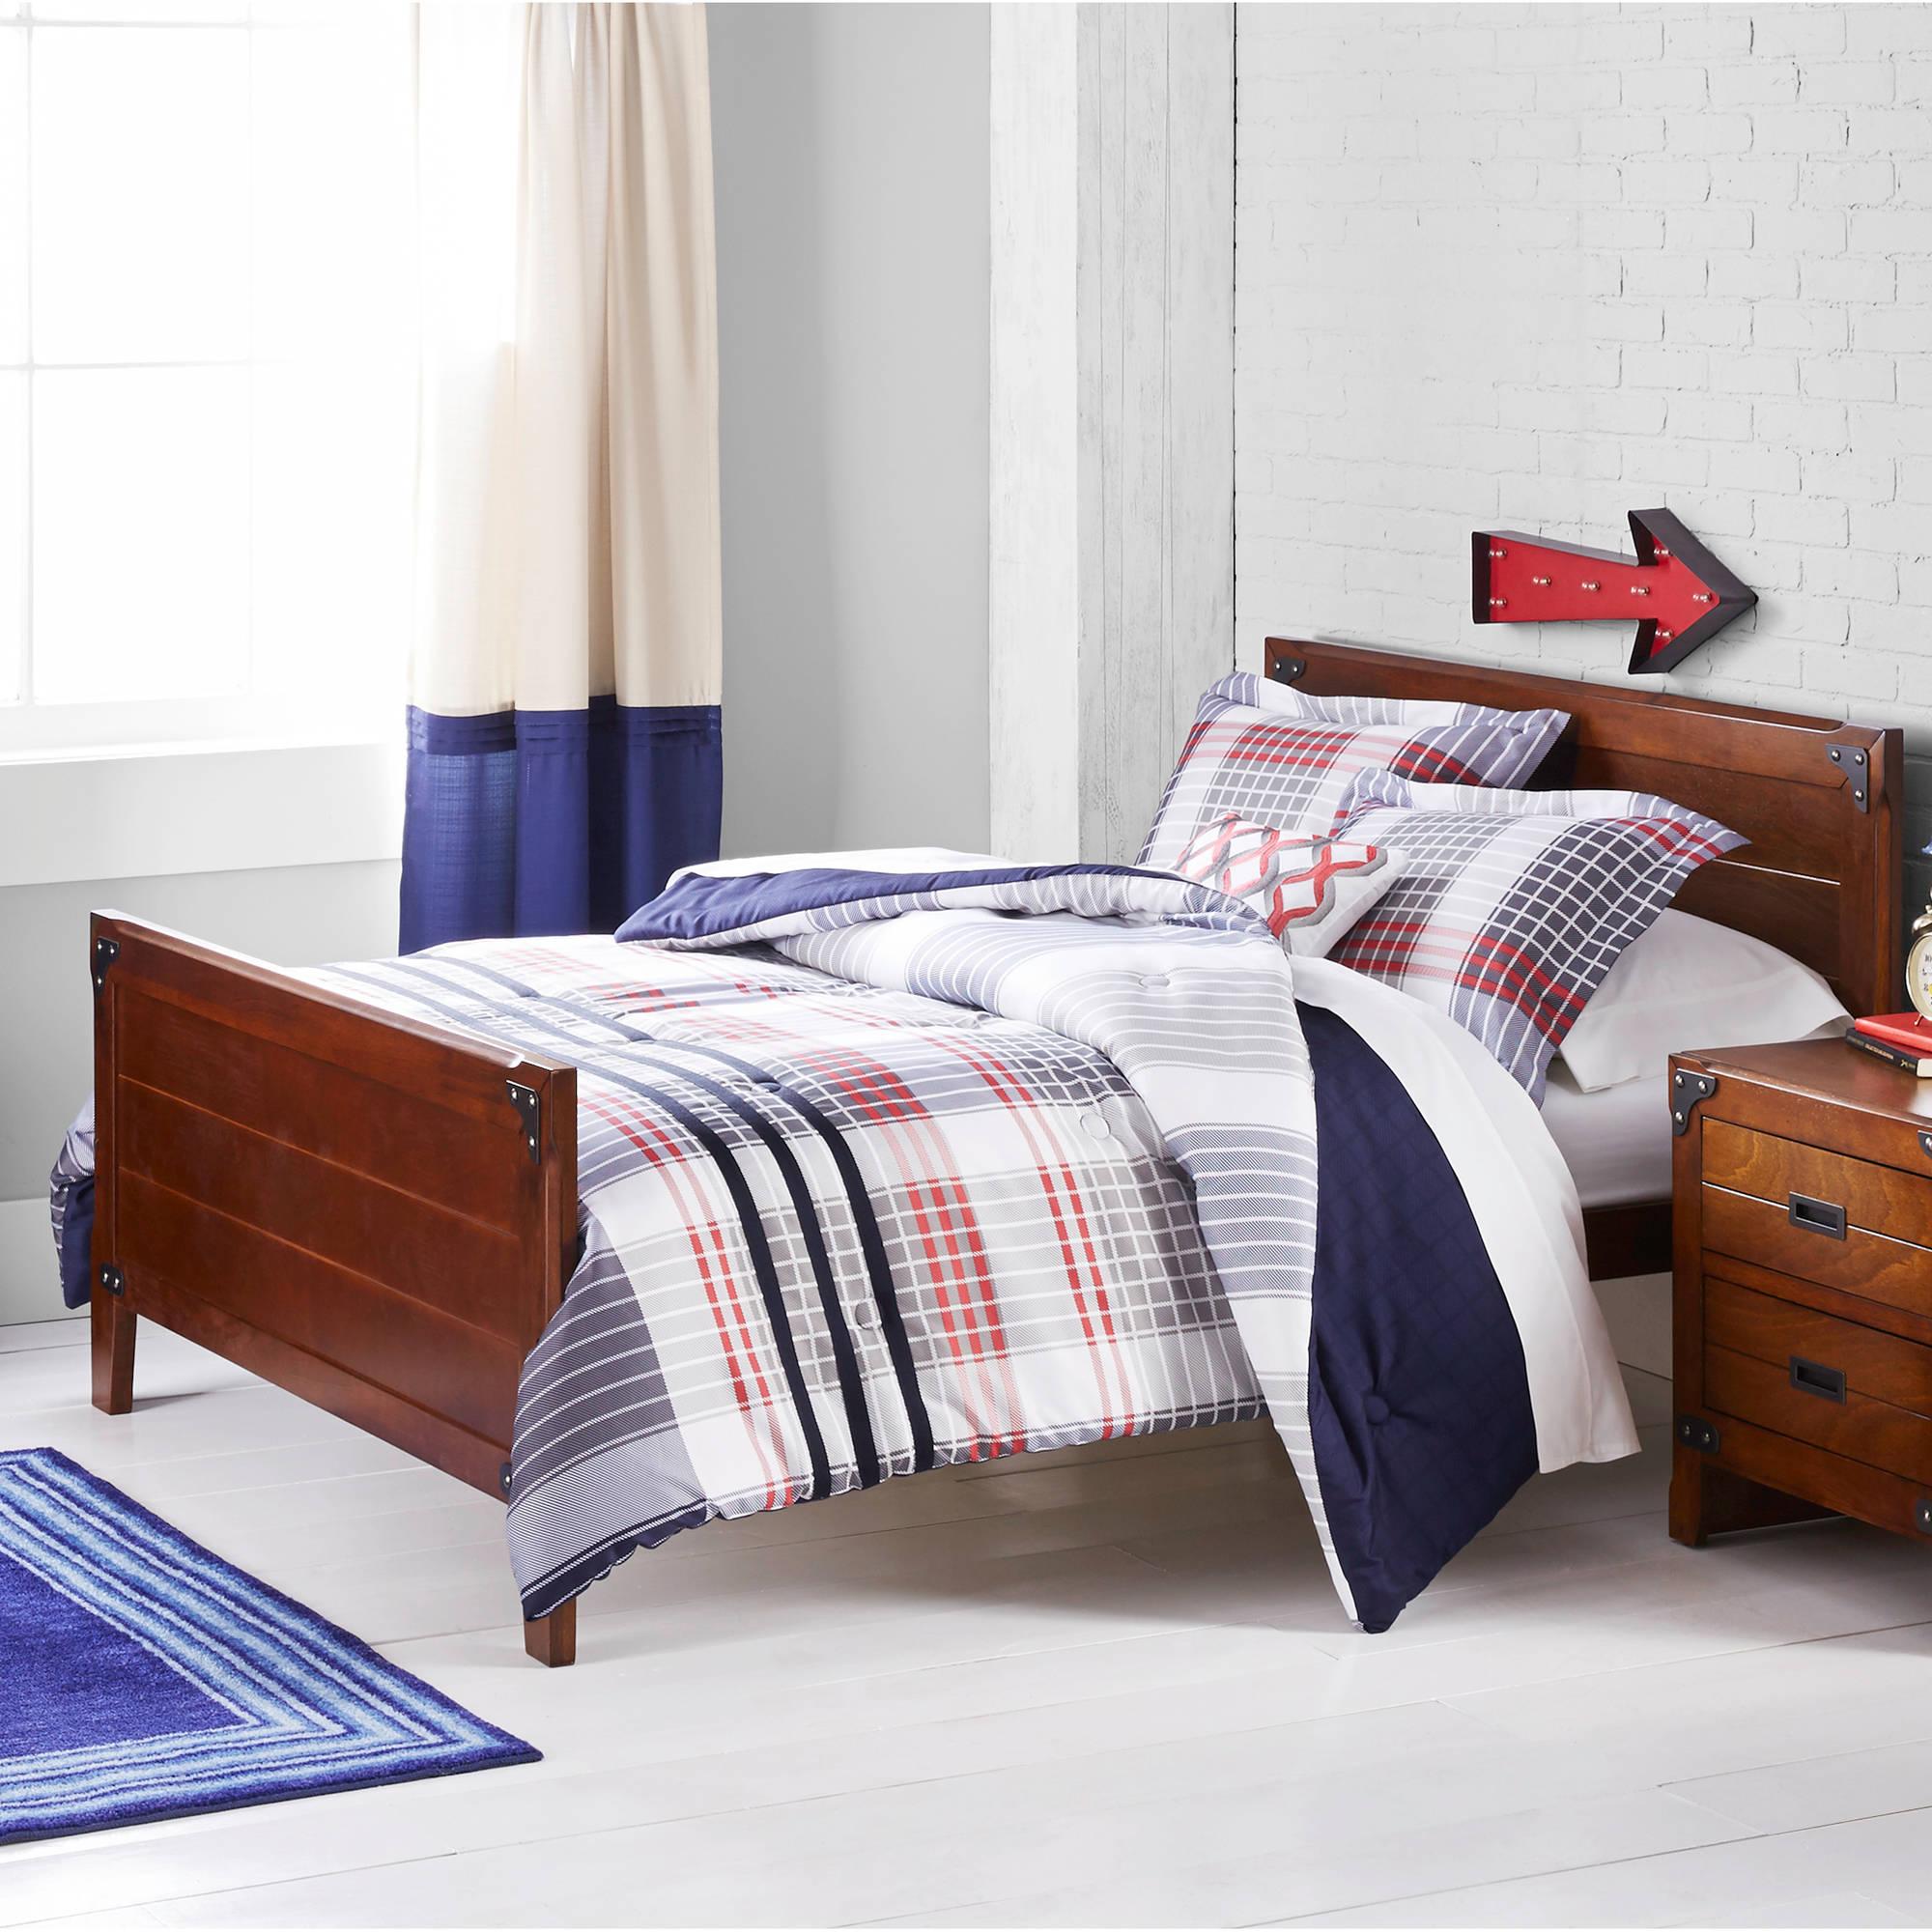 E & E Co. Better Homes and Gardens Kids Navy Plaid Bedding Comforter Set